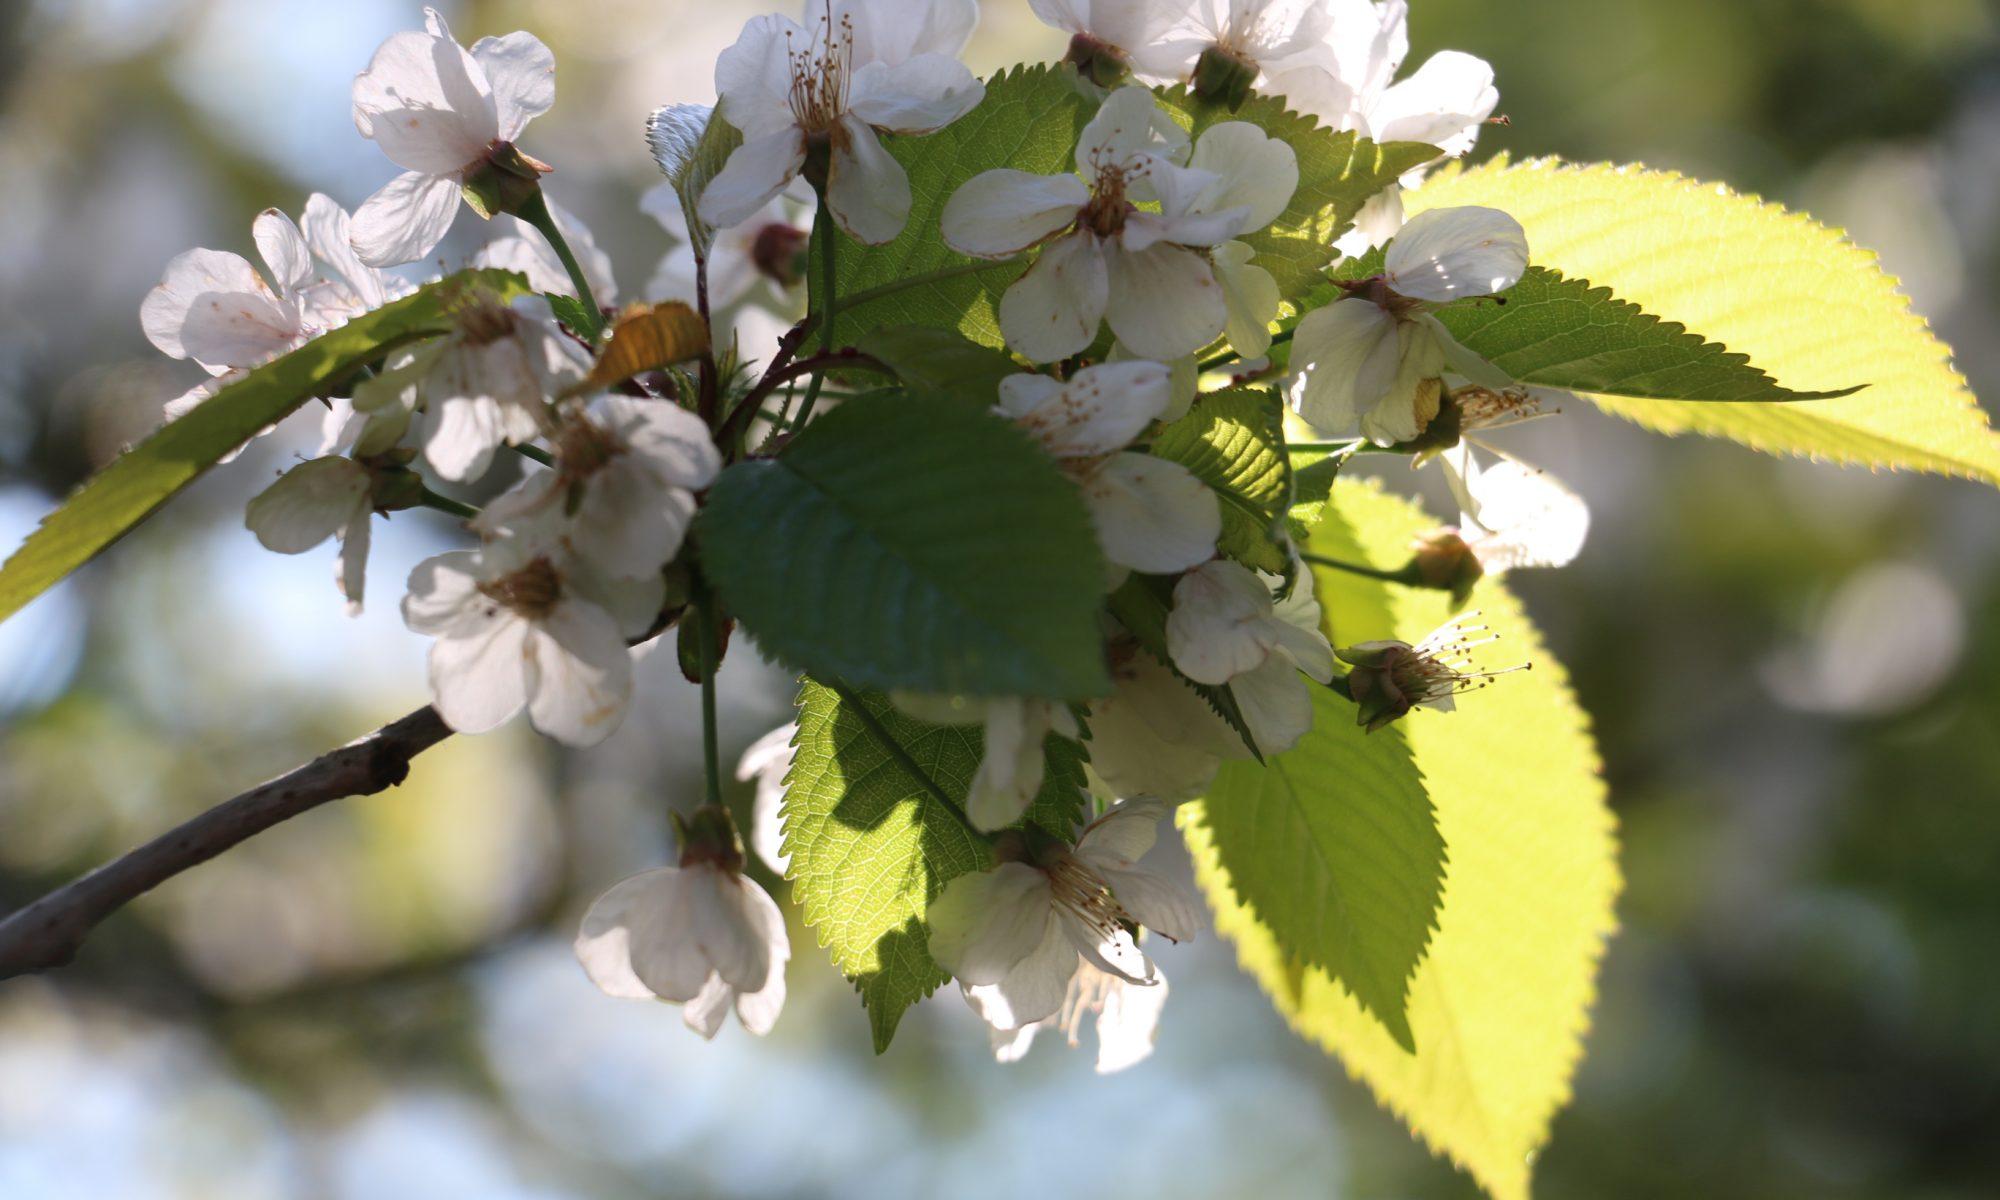 Flower blossom on a tree